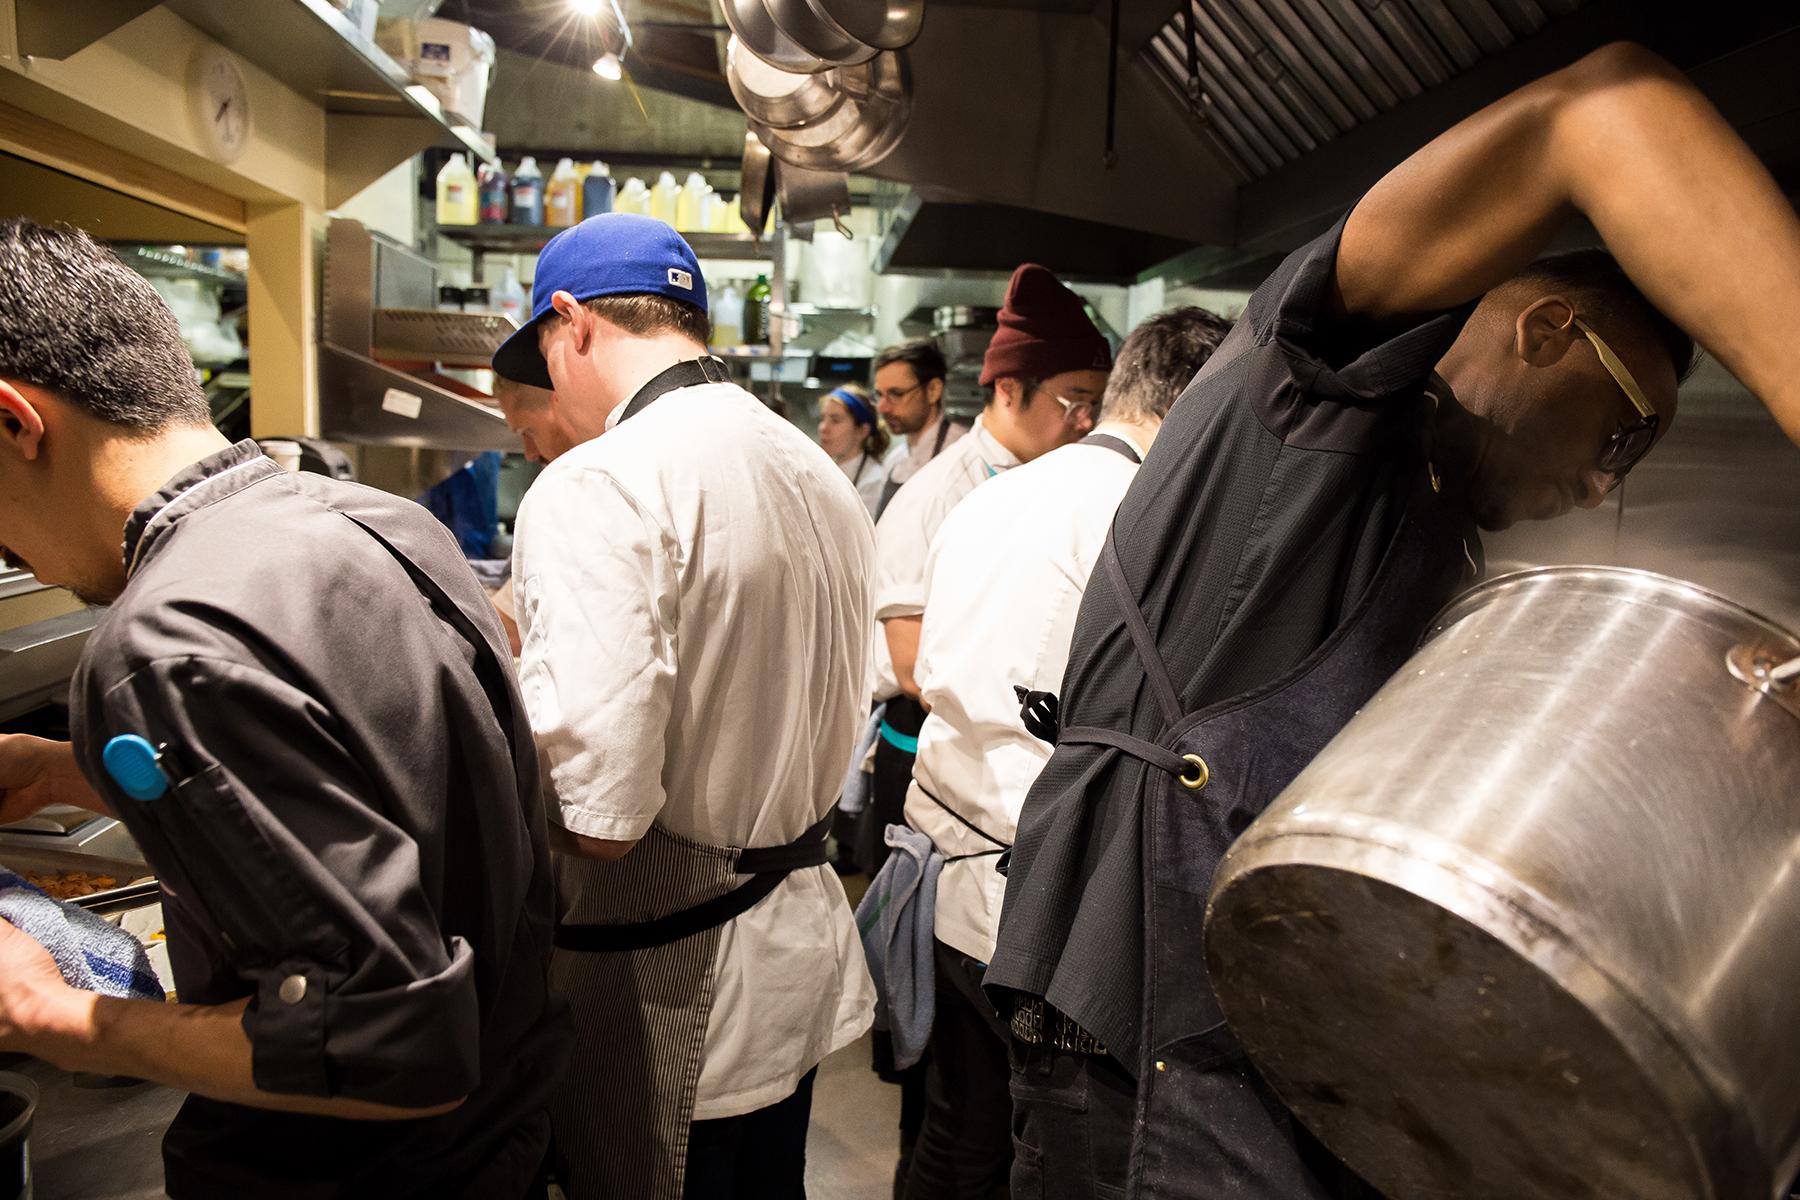 ChefsWeekPDX12_creditCarlyDiaz.jpg